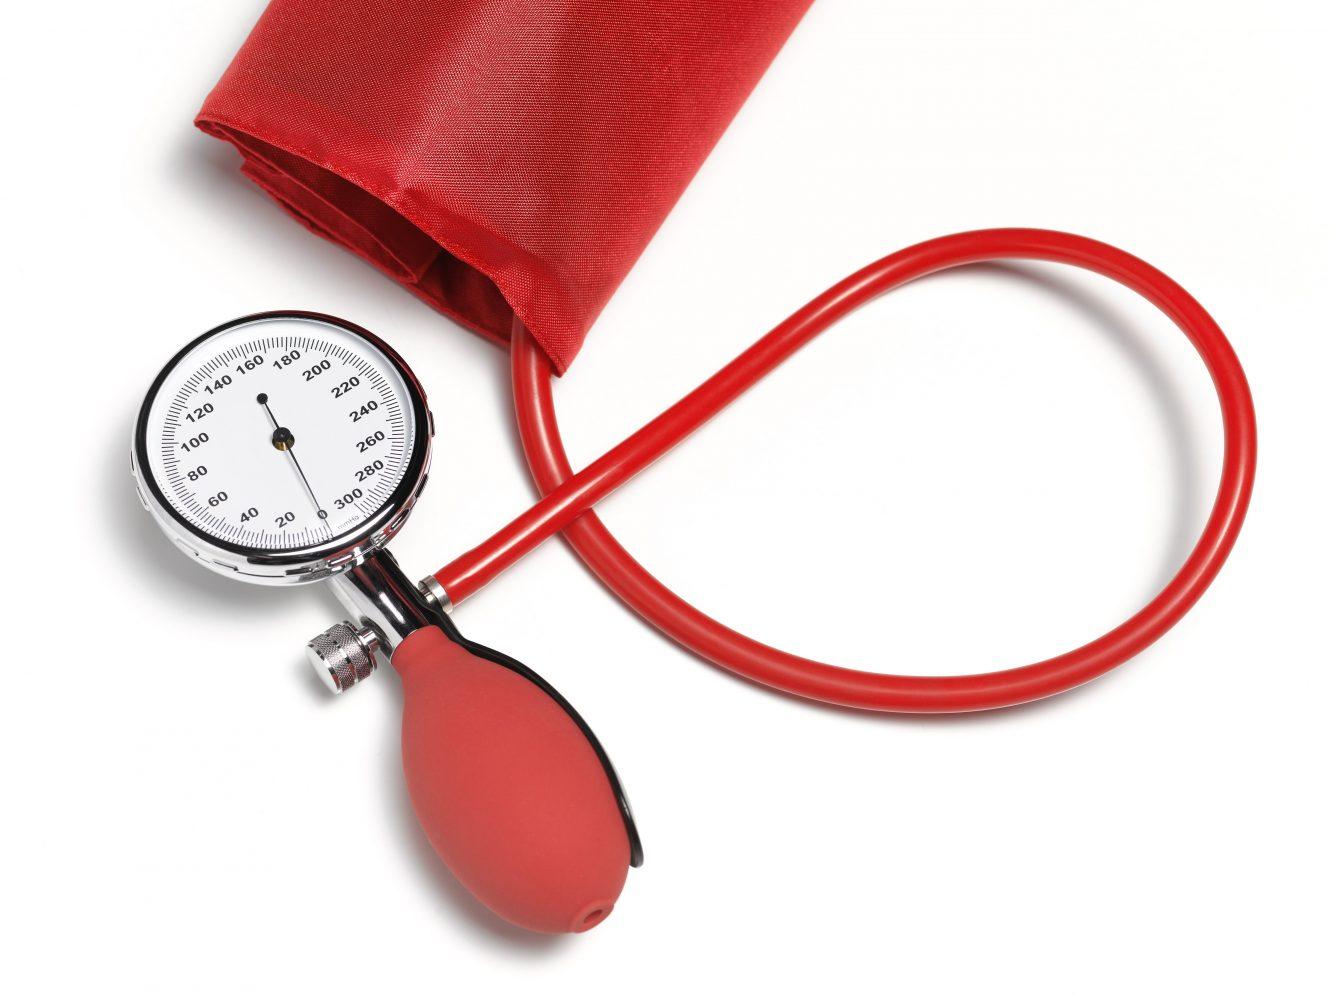 hipertenzija rizik korak 1: 3